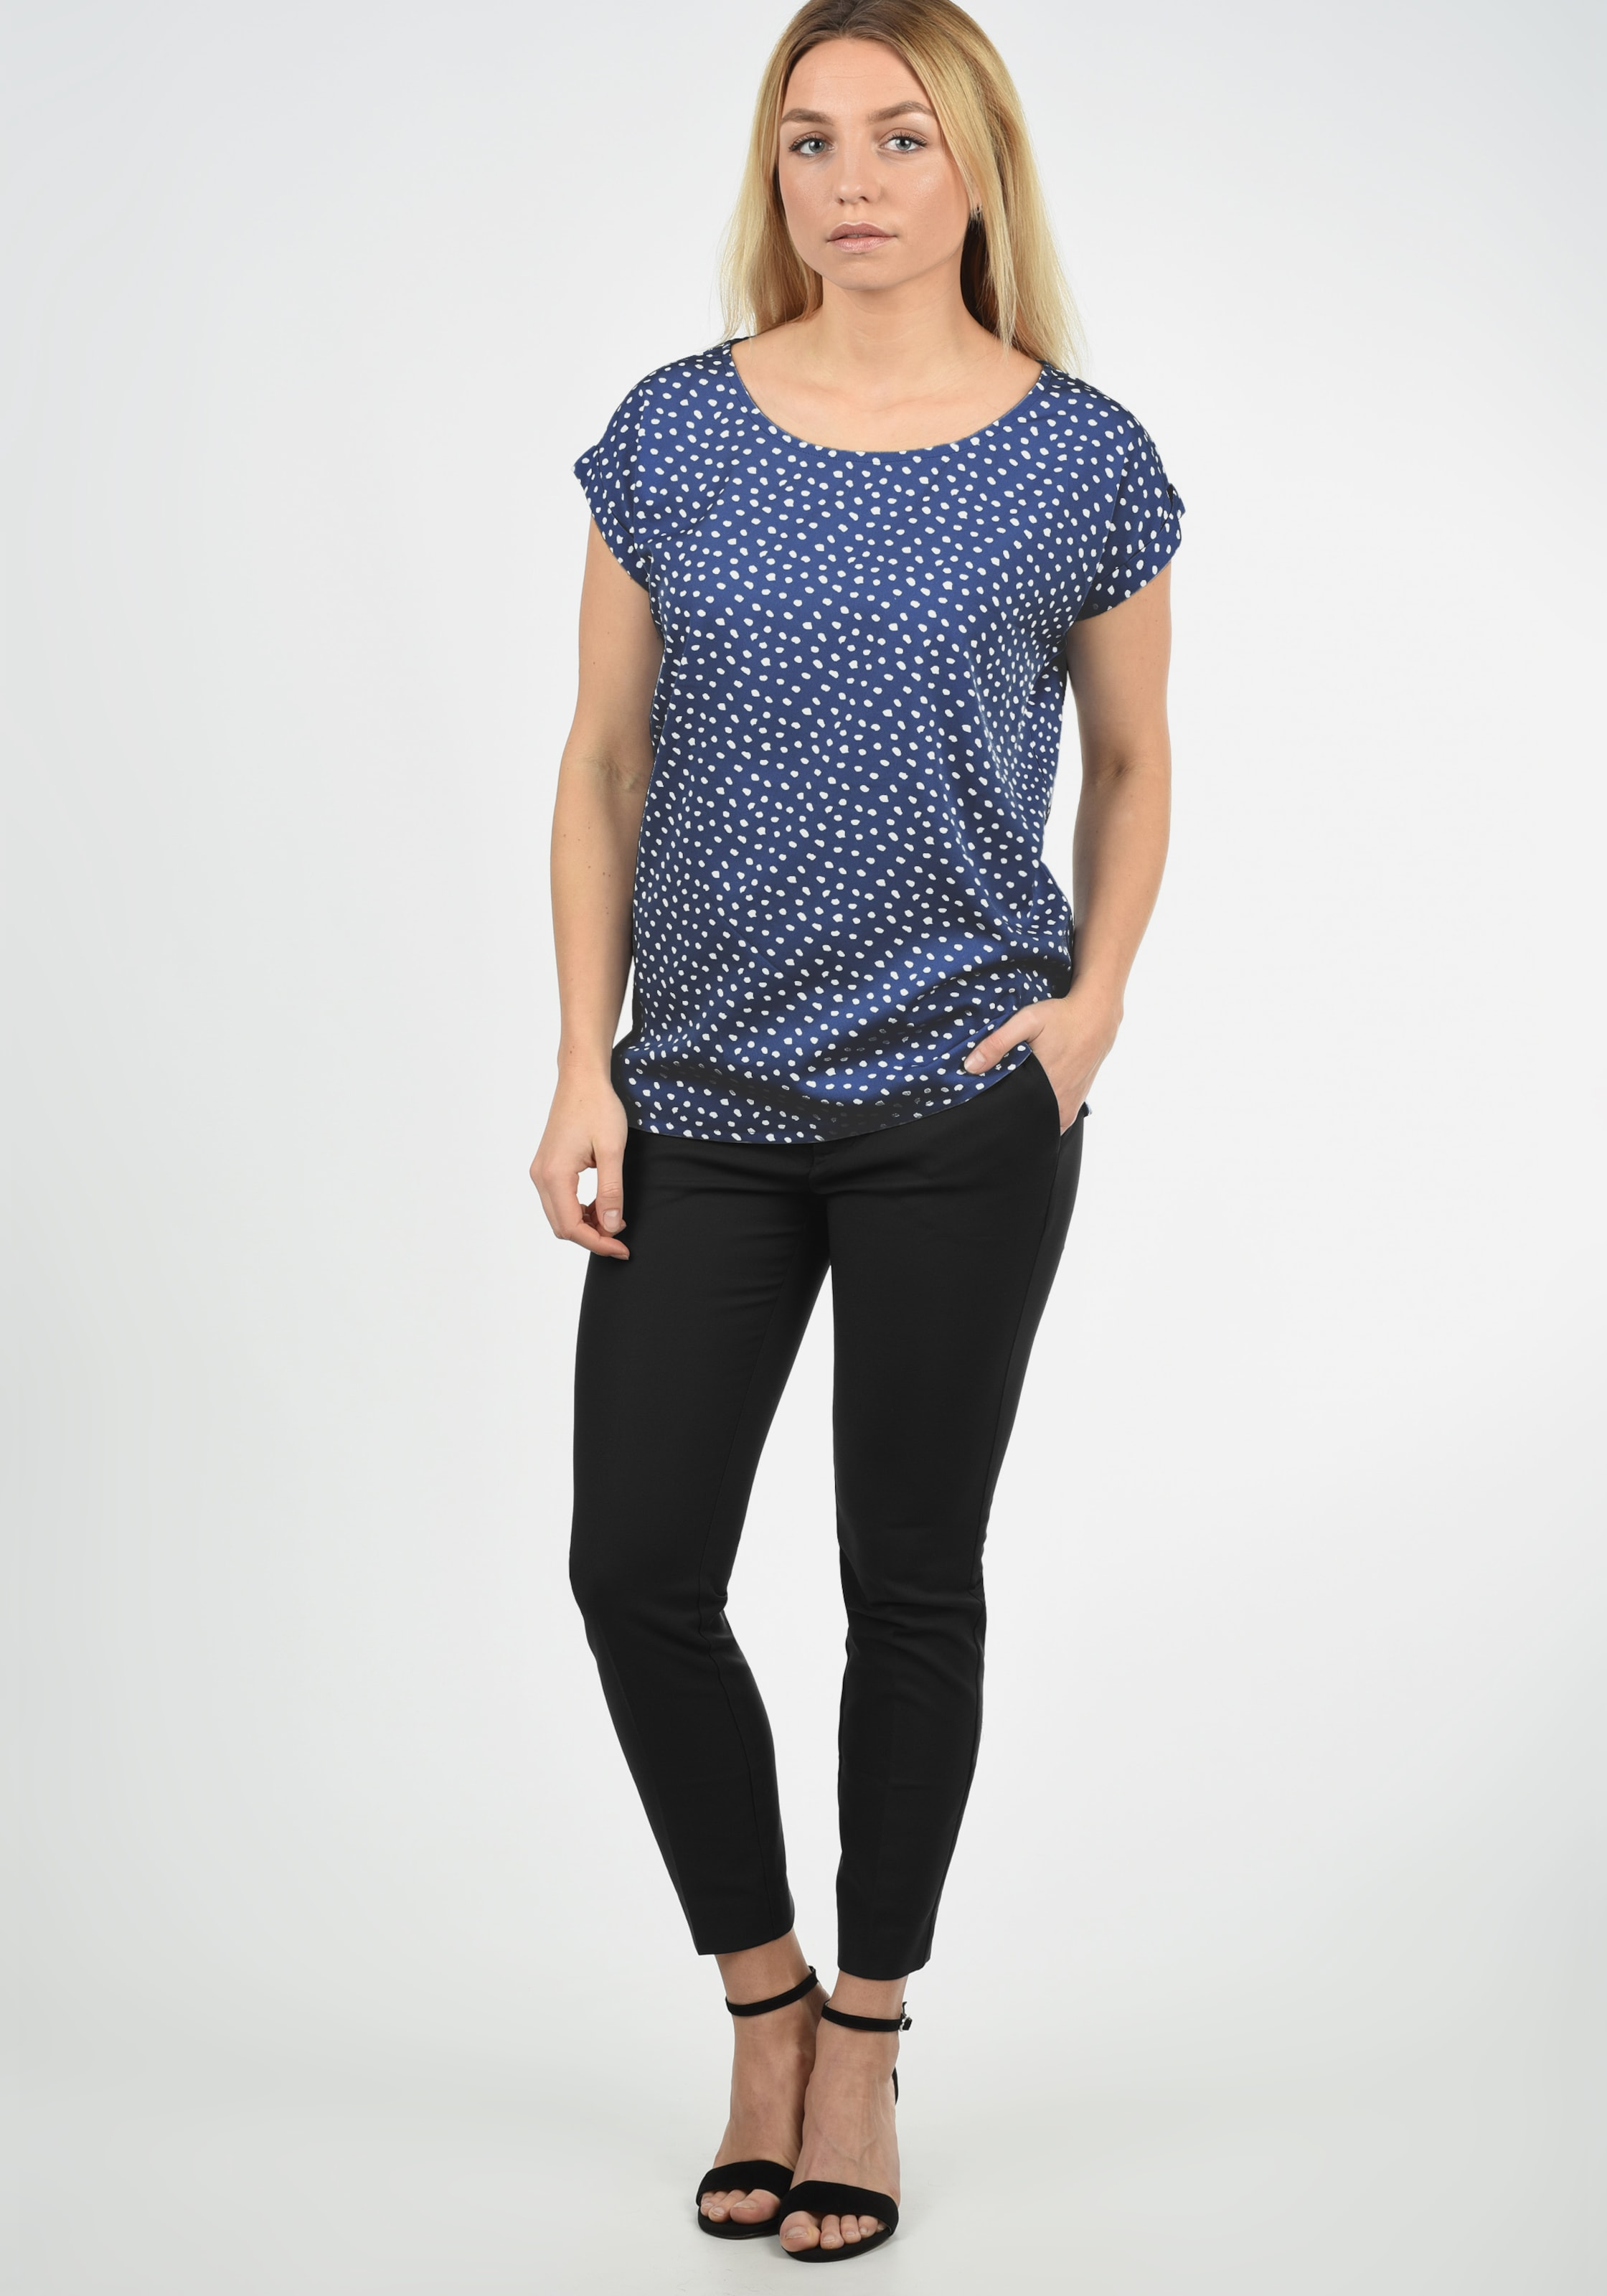 She Shirtbluse In Blend Blau 'amarena' 0X8PwZnkNO